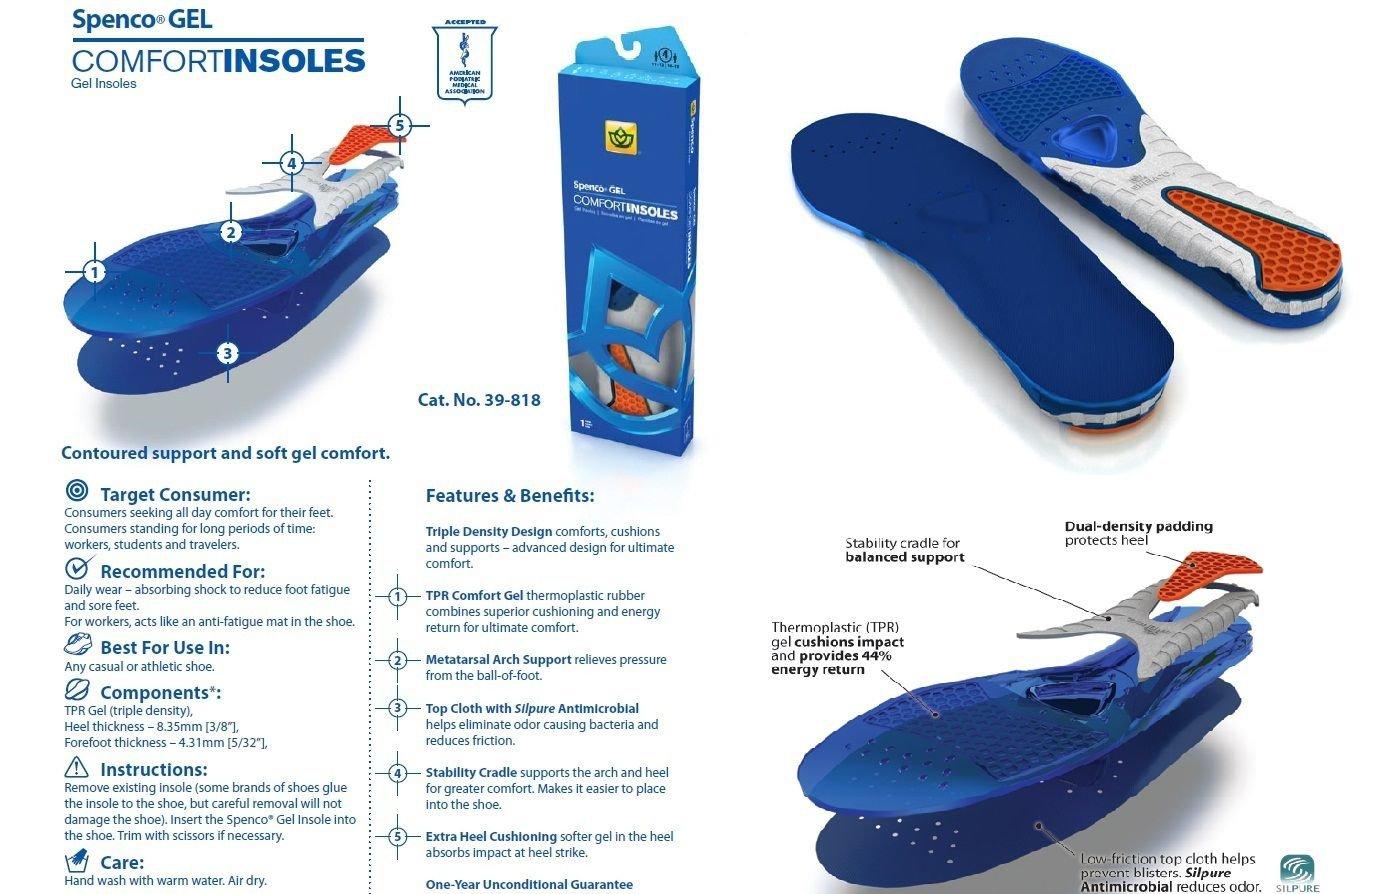 Spenco Gel Comfort Insoles Inserts Anti-Slip Support 39-818 Men's 10-11 Size